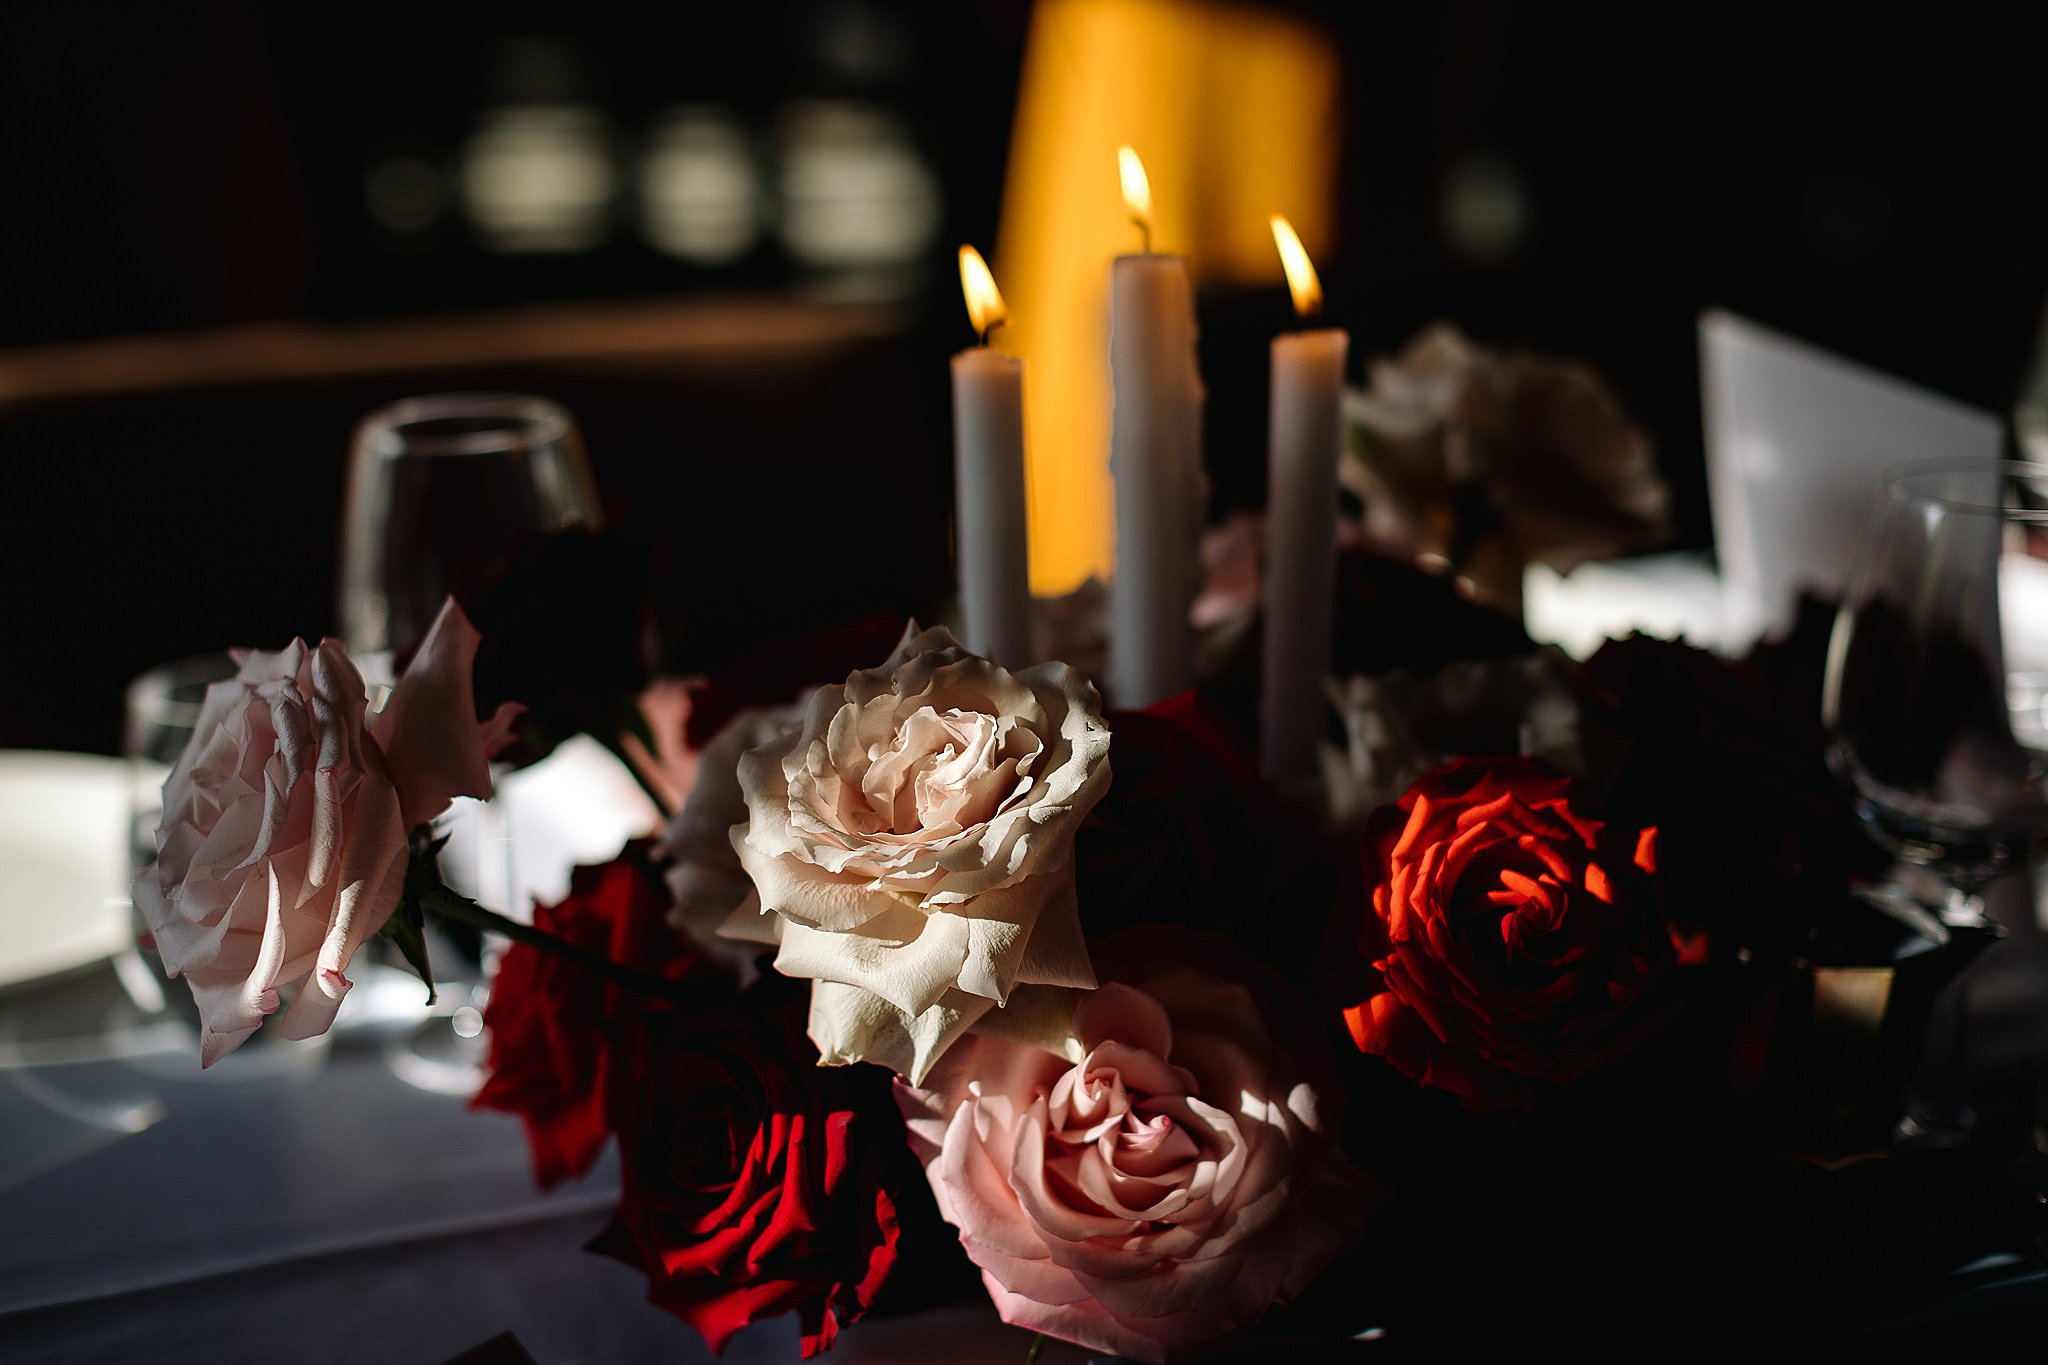 2020 weddings,Wedding,South Coast Wedding,Southern Highlands Wedding,canberra wedding,Canberra Wedding Photographer,canberra weddings,Canberra Wedding Photography,ACT wedding photographer,ACT weddings,Keepsakephoto by the Keeffes,Canberra Portrait Photography,Canberra Photography,canberra florist,